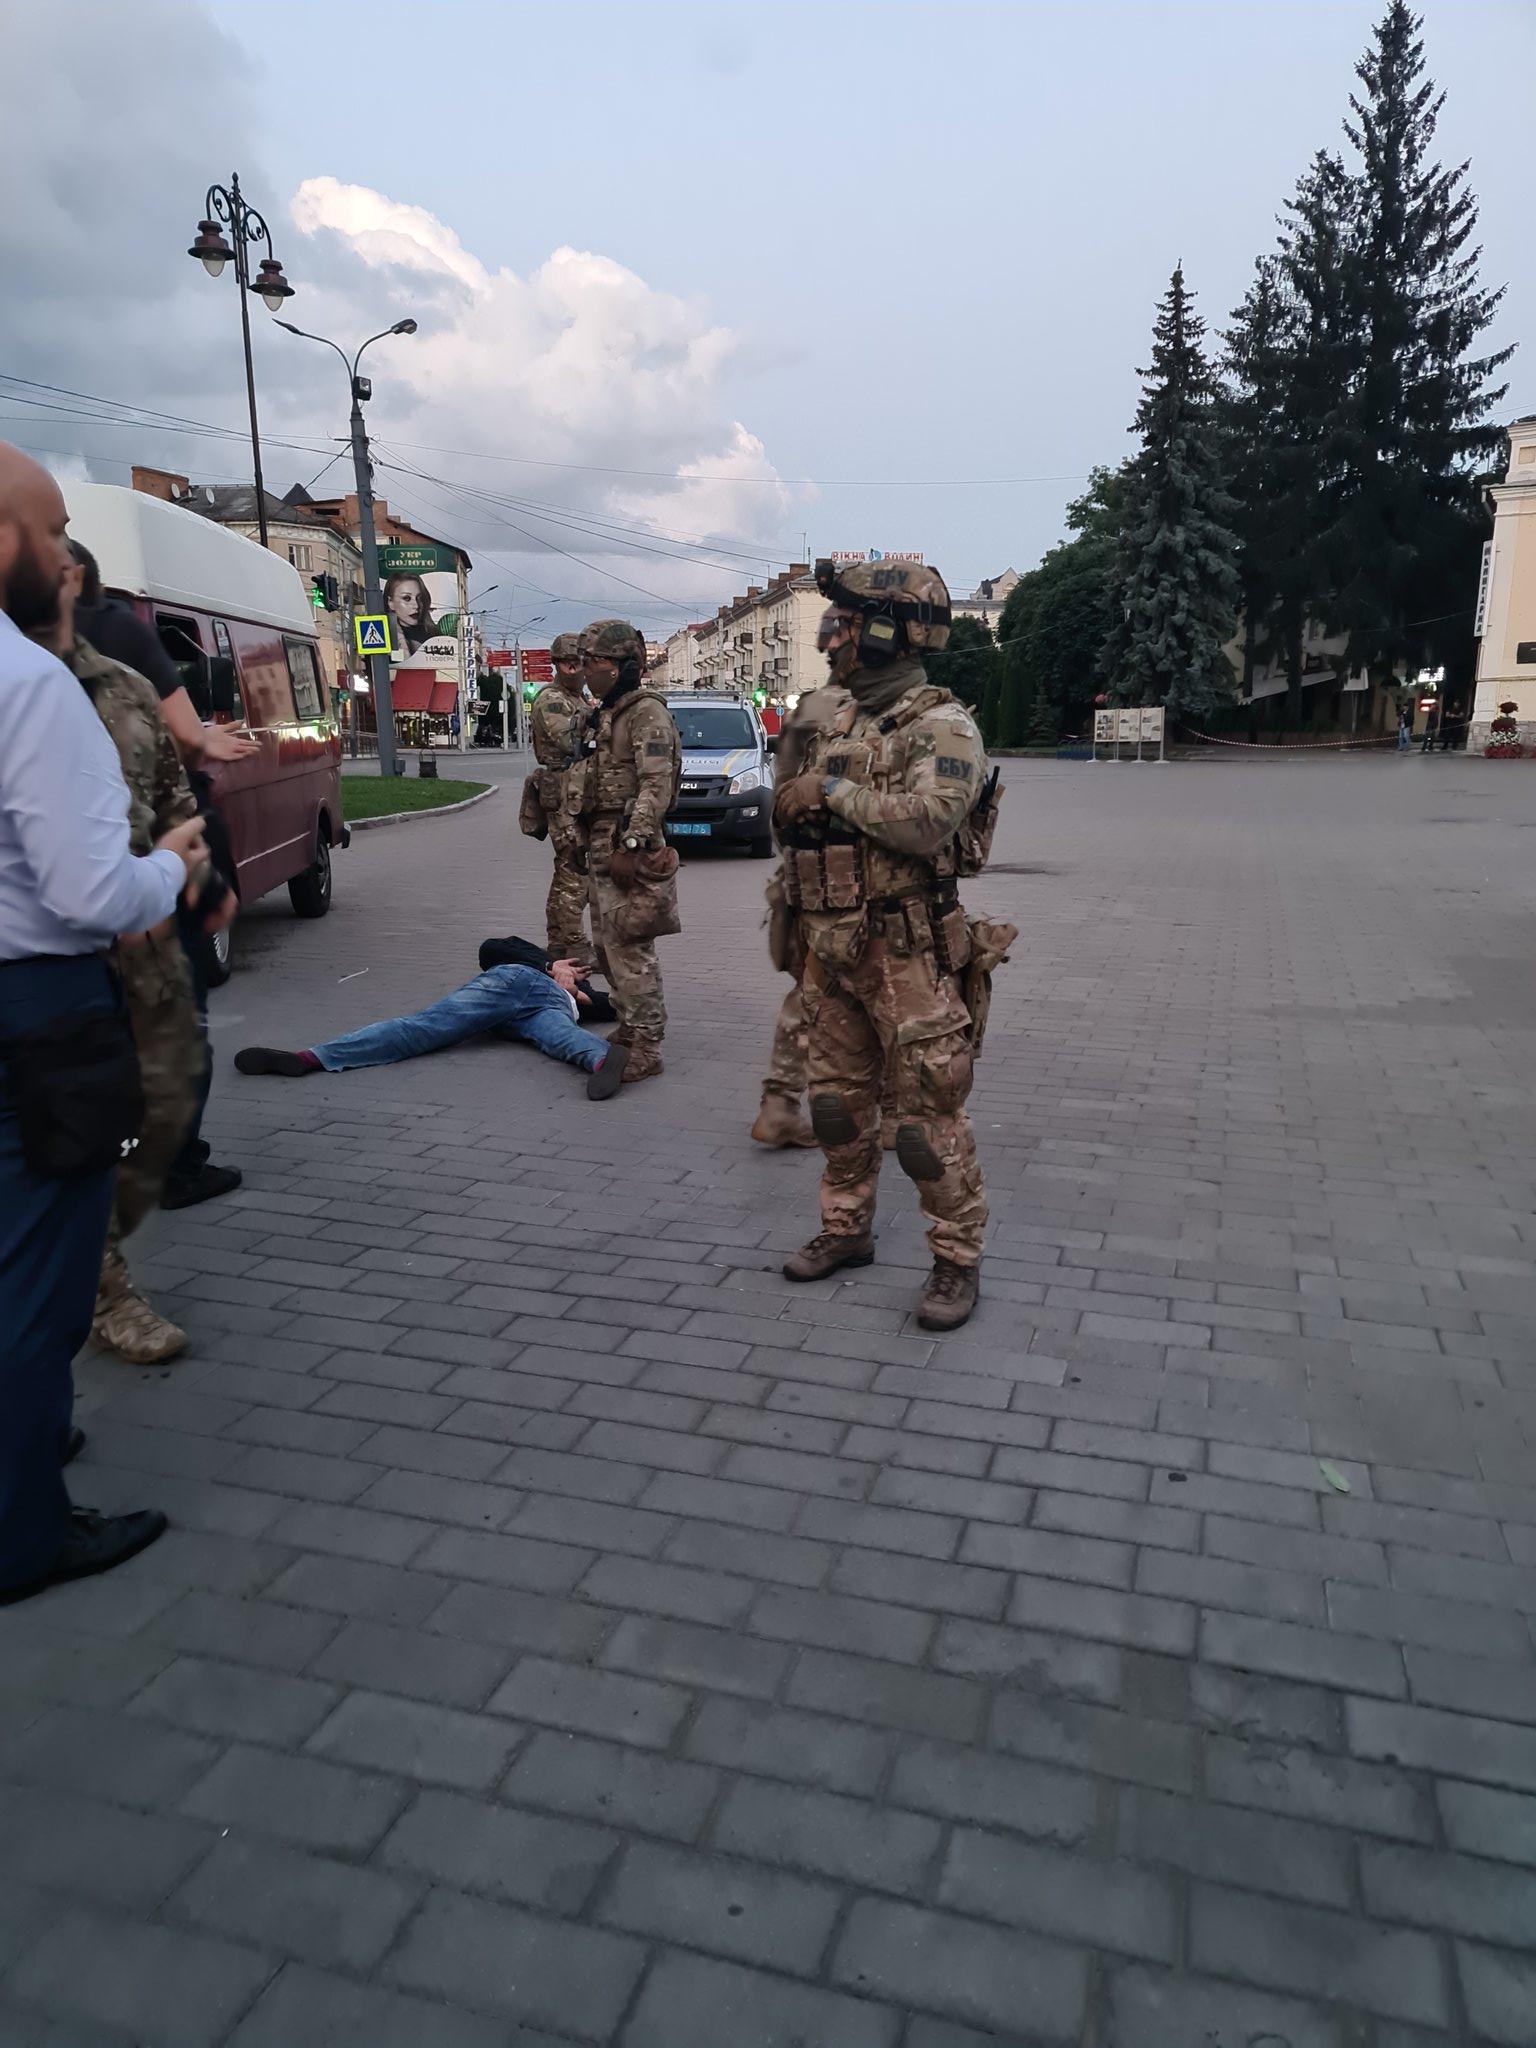 Задержание террориста в Луцке (Фото: twitter.com/AvakovArsen)